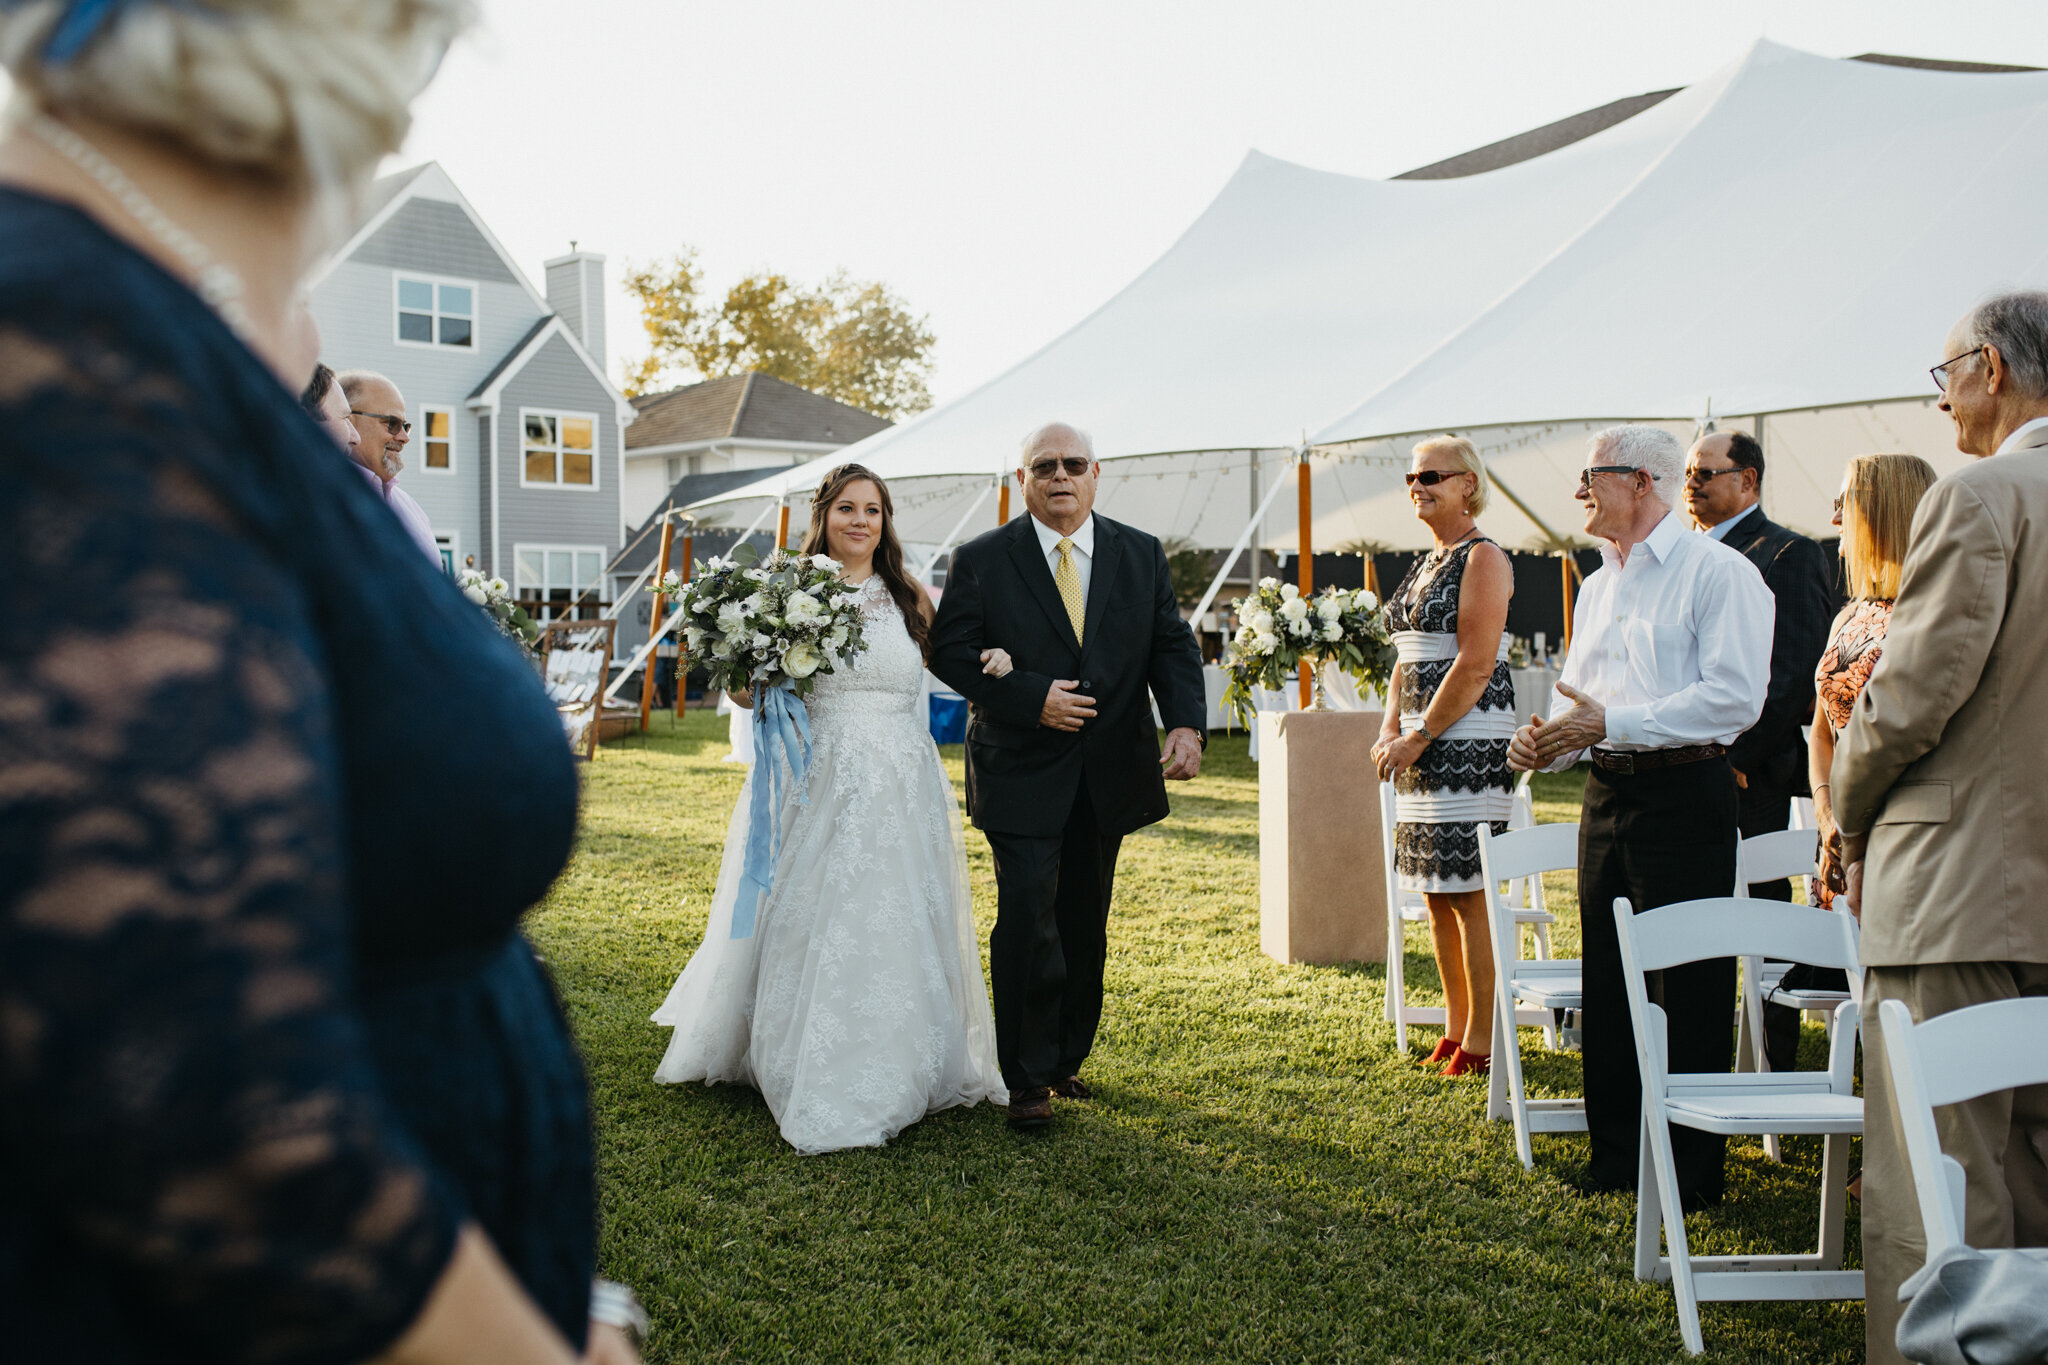 angela_jason_norfolk_wedding-96.jpg